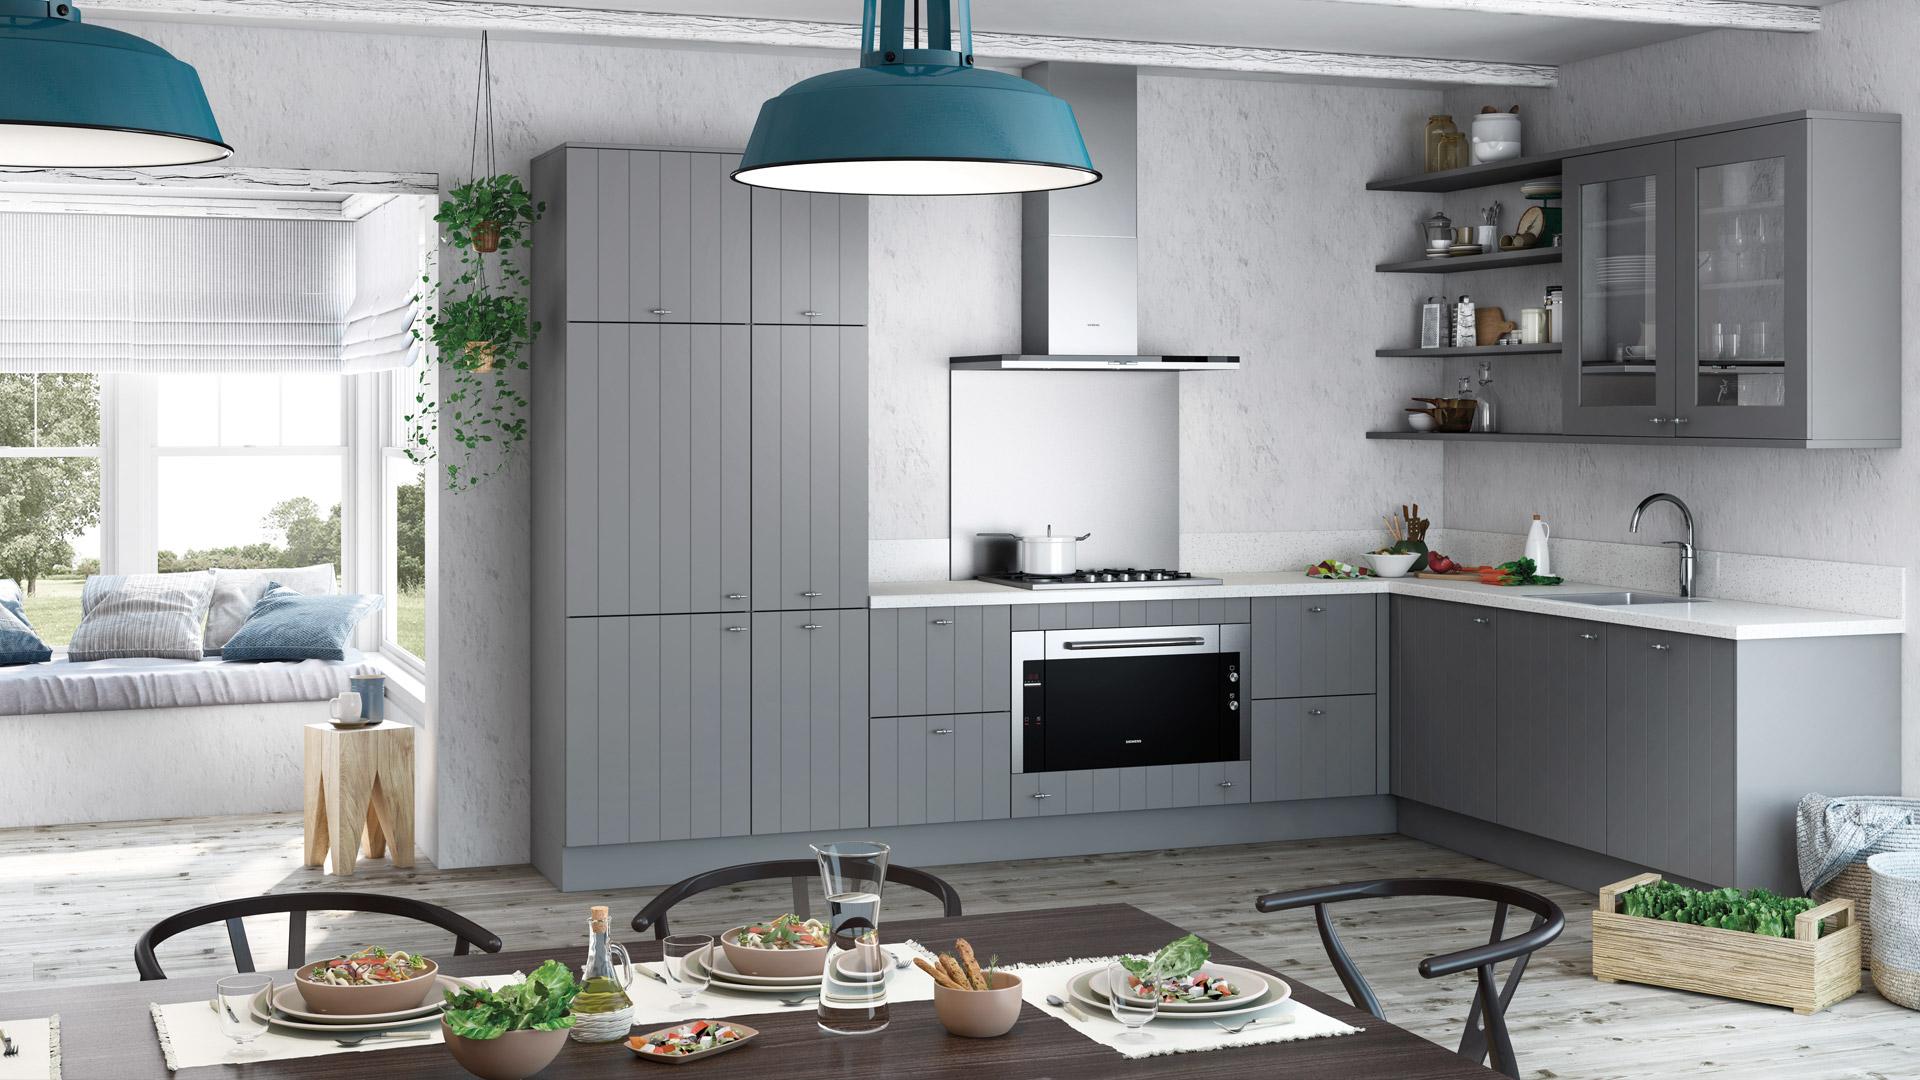 Bribus keukens prijslijst bribus keuken kast knap artistiek